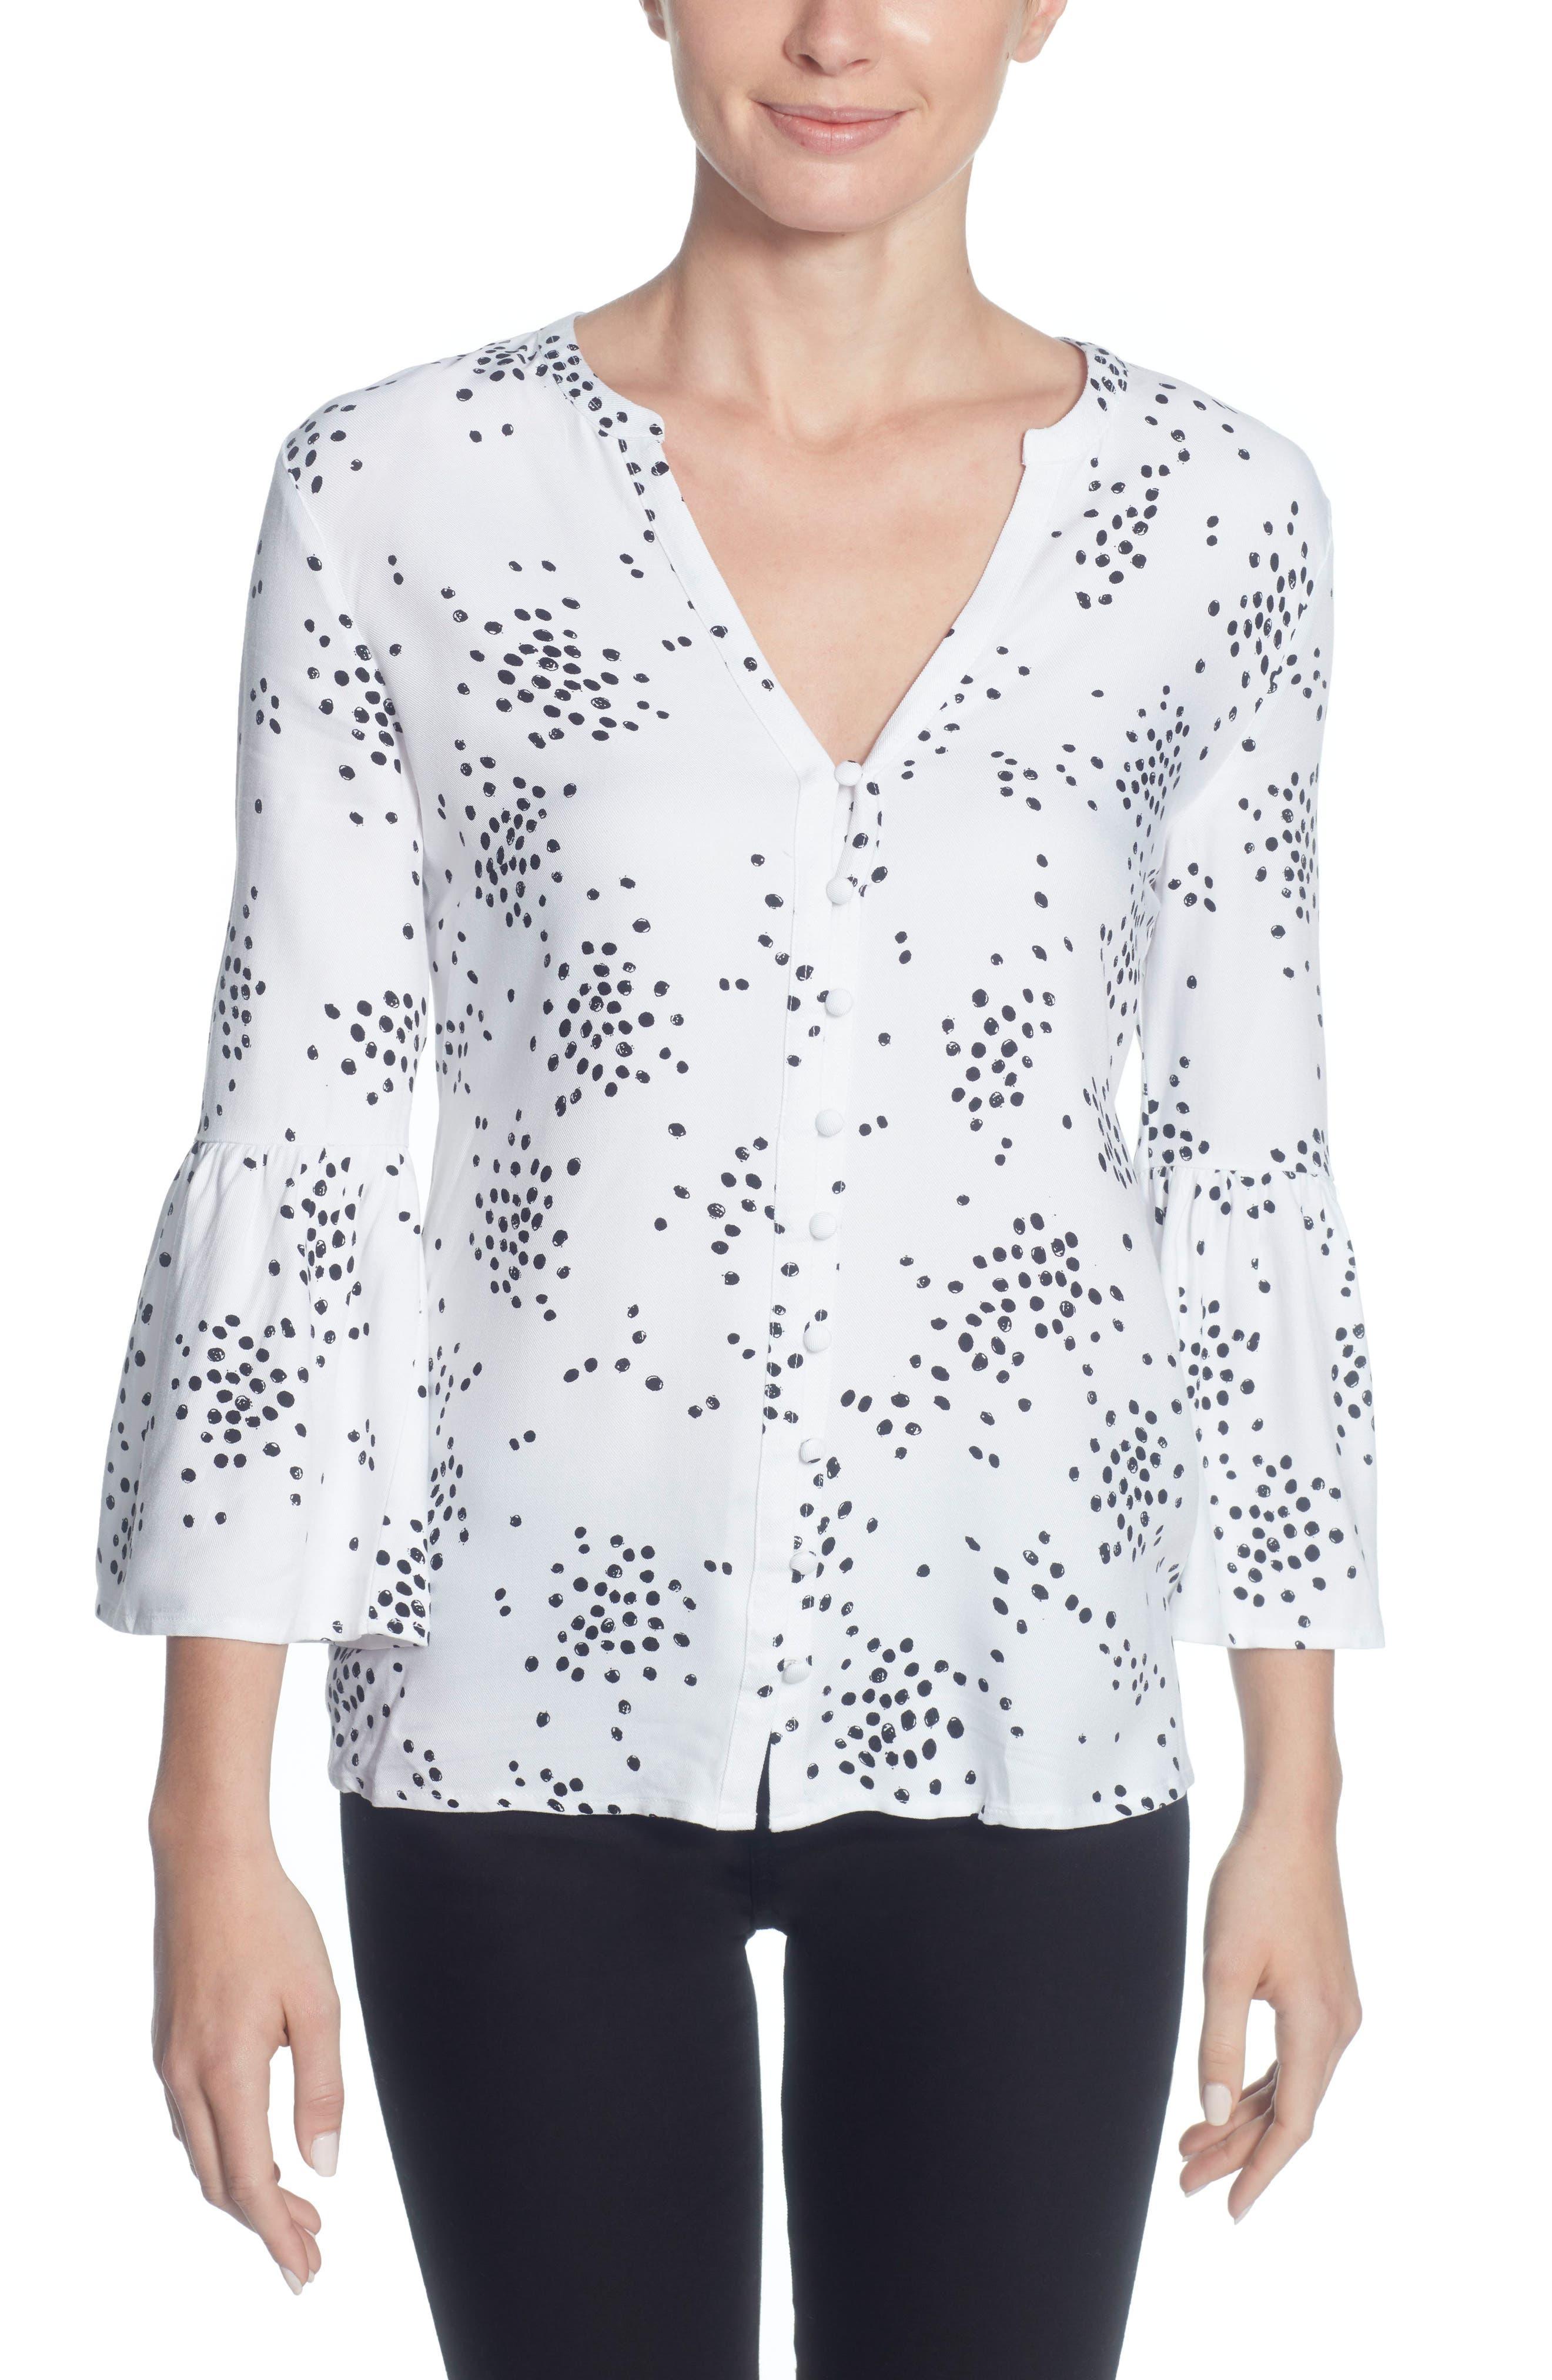 Colette Ruffle Sleeve Blouse,                         Main,                         color, 100